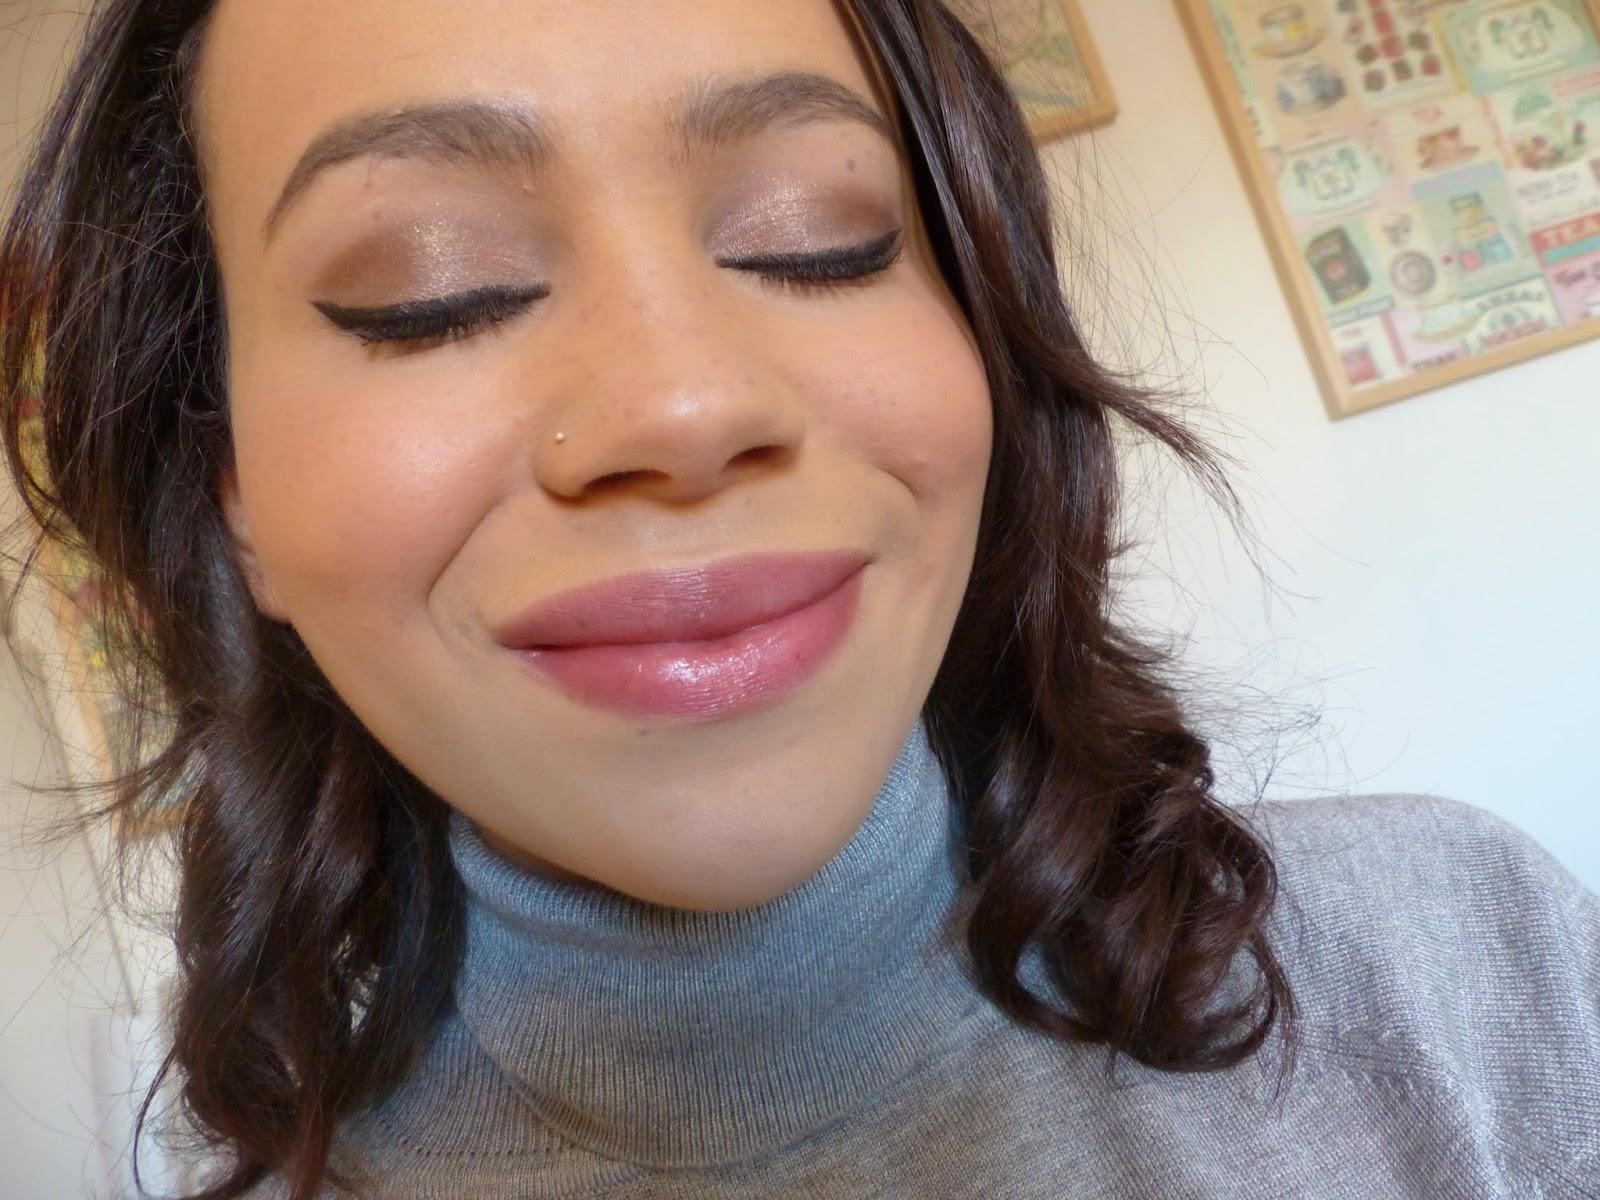 Review Swatches Kiko Long Lasting Stick Eyeshadows Jasmine